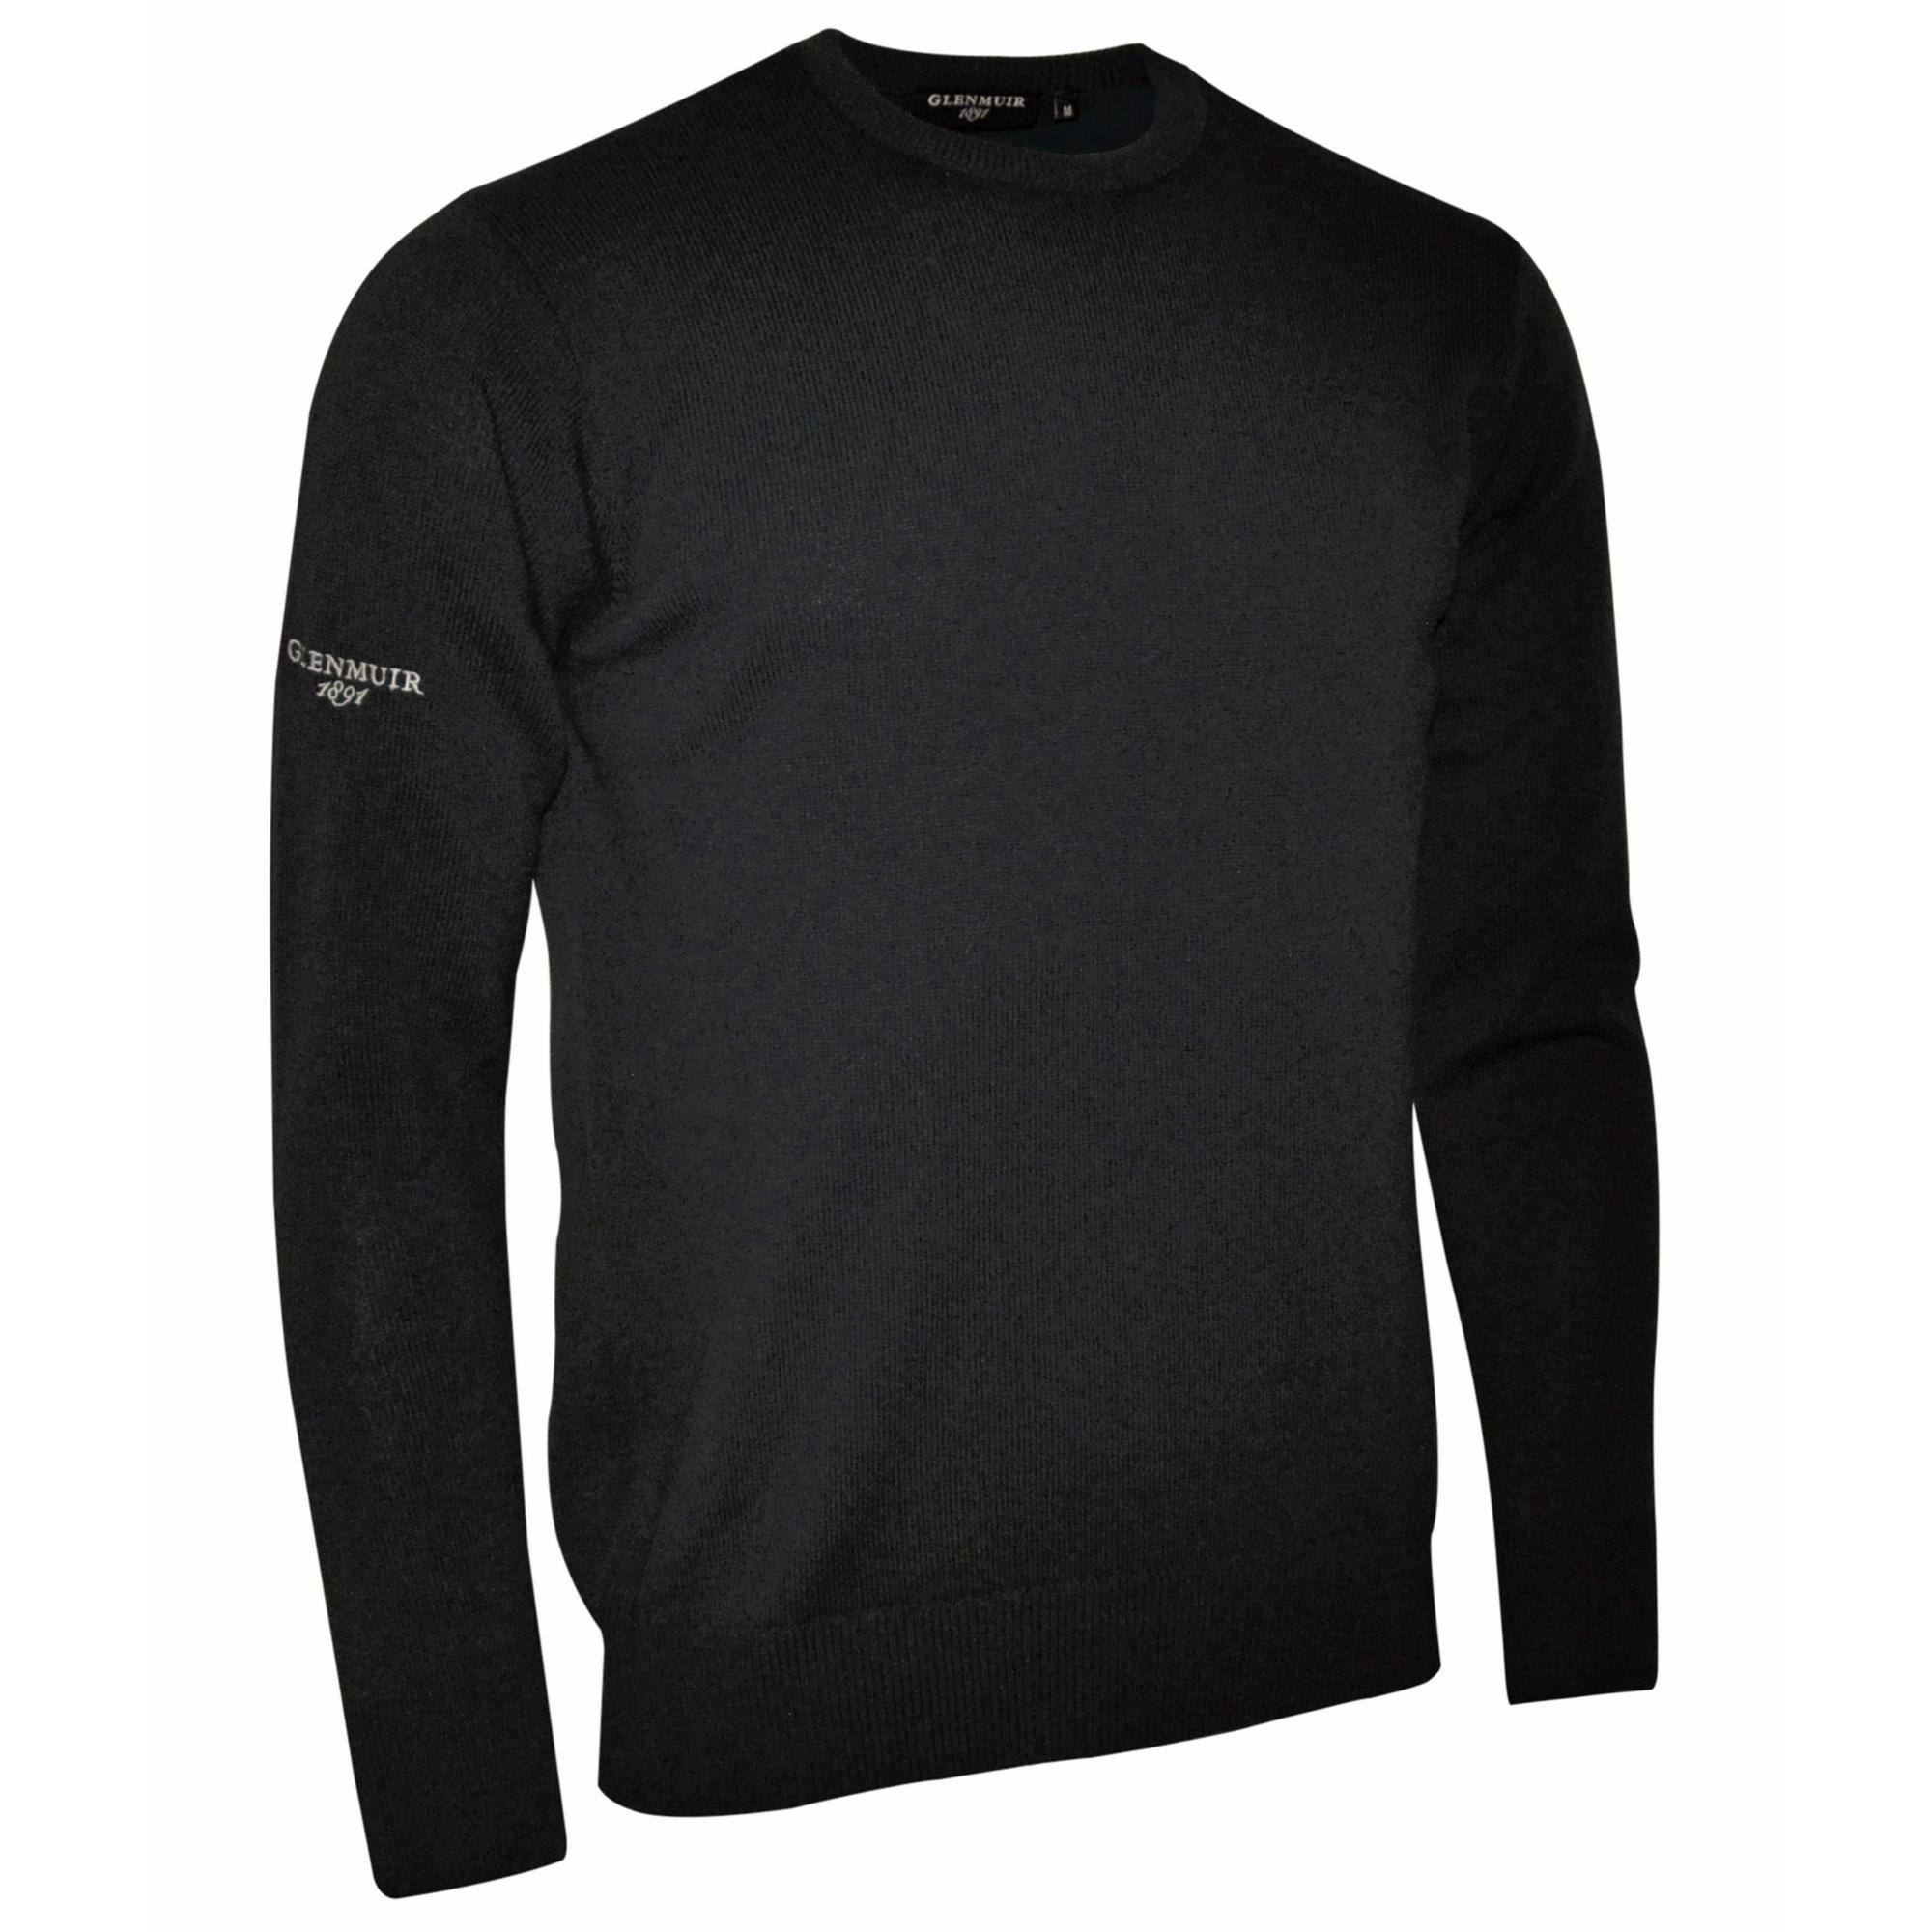 Glenmuir Morar Mens Crew Neck Sweater (2XL) (Black)